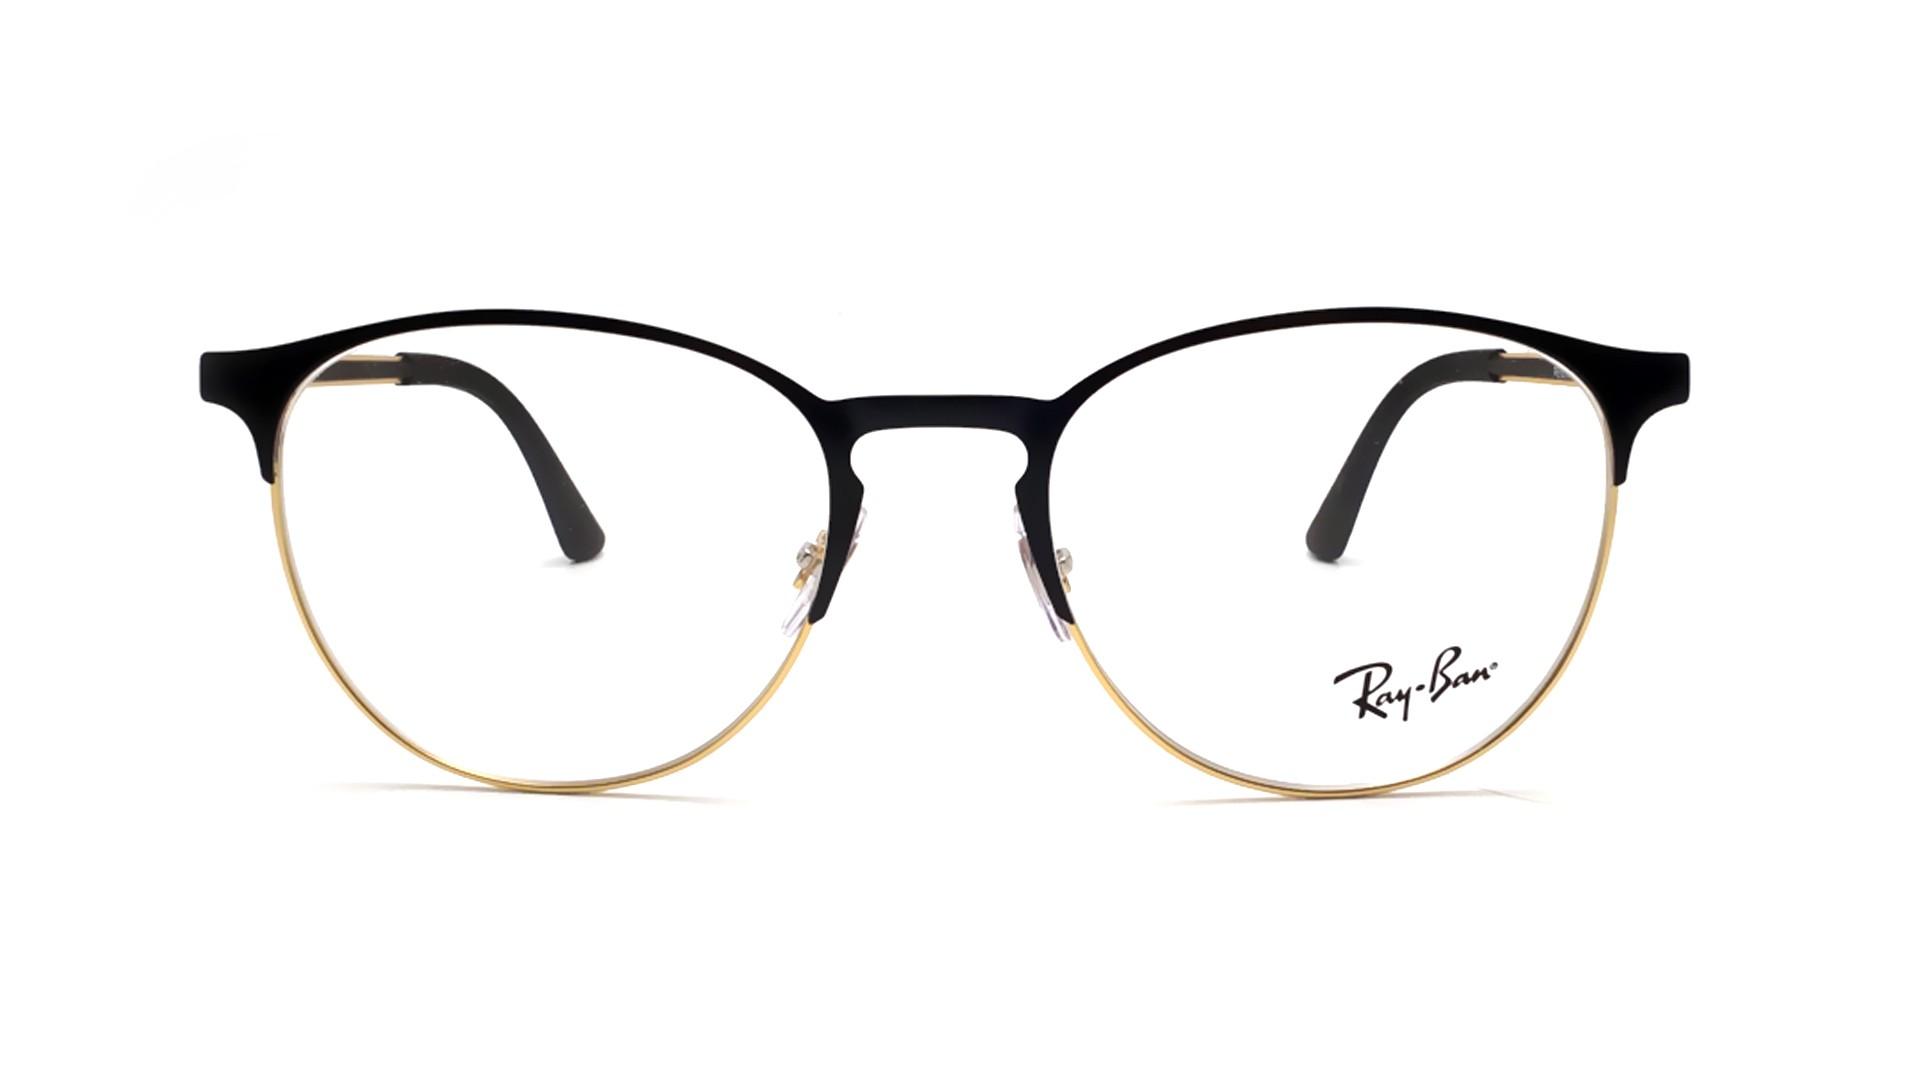 Ray-Ban RX6375 RB6375 2890 51-18 Noir   Prix 77,90 €   Visiofactory 5596c40113cc